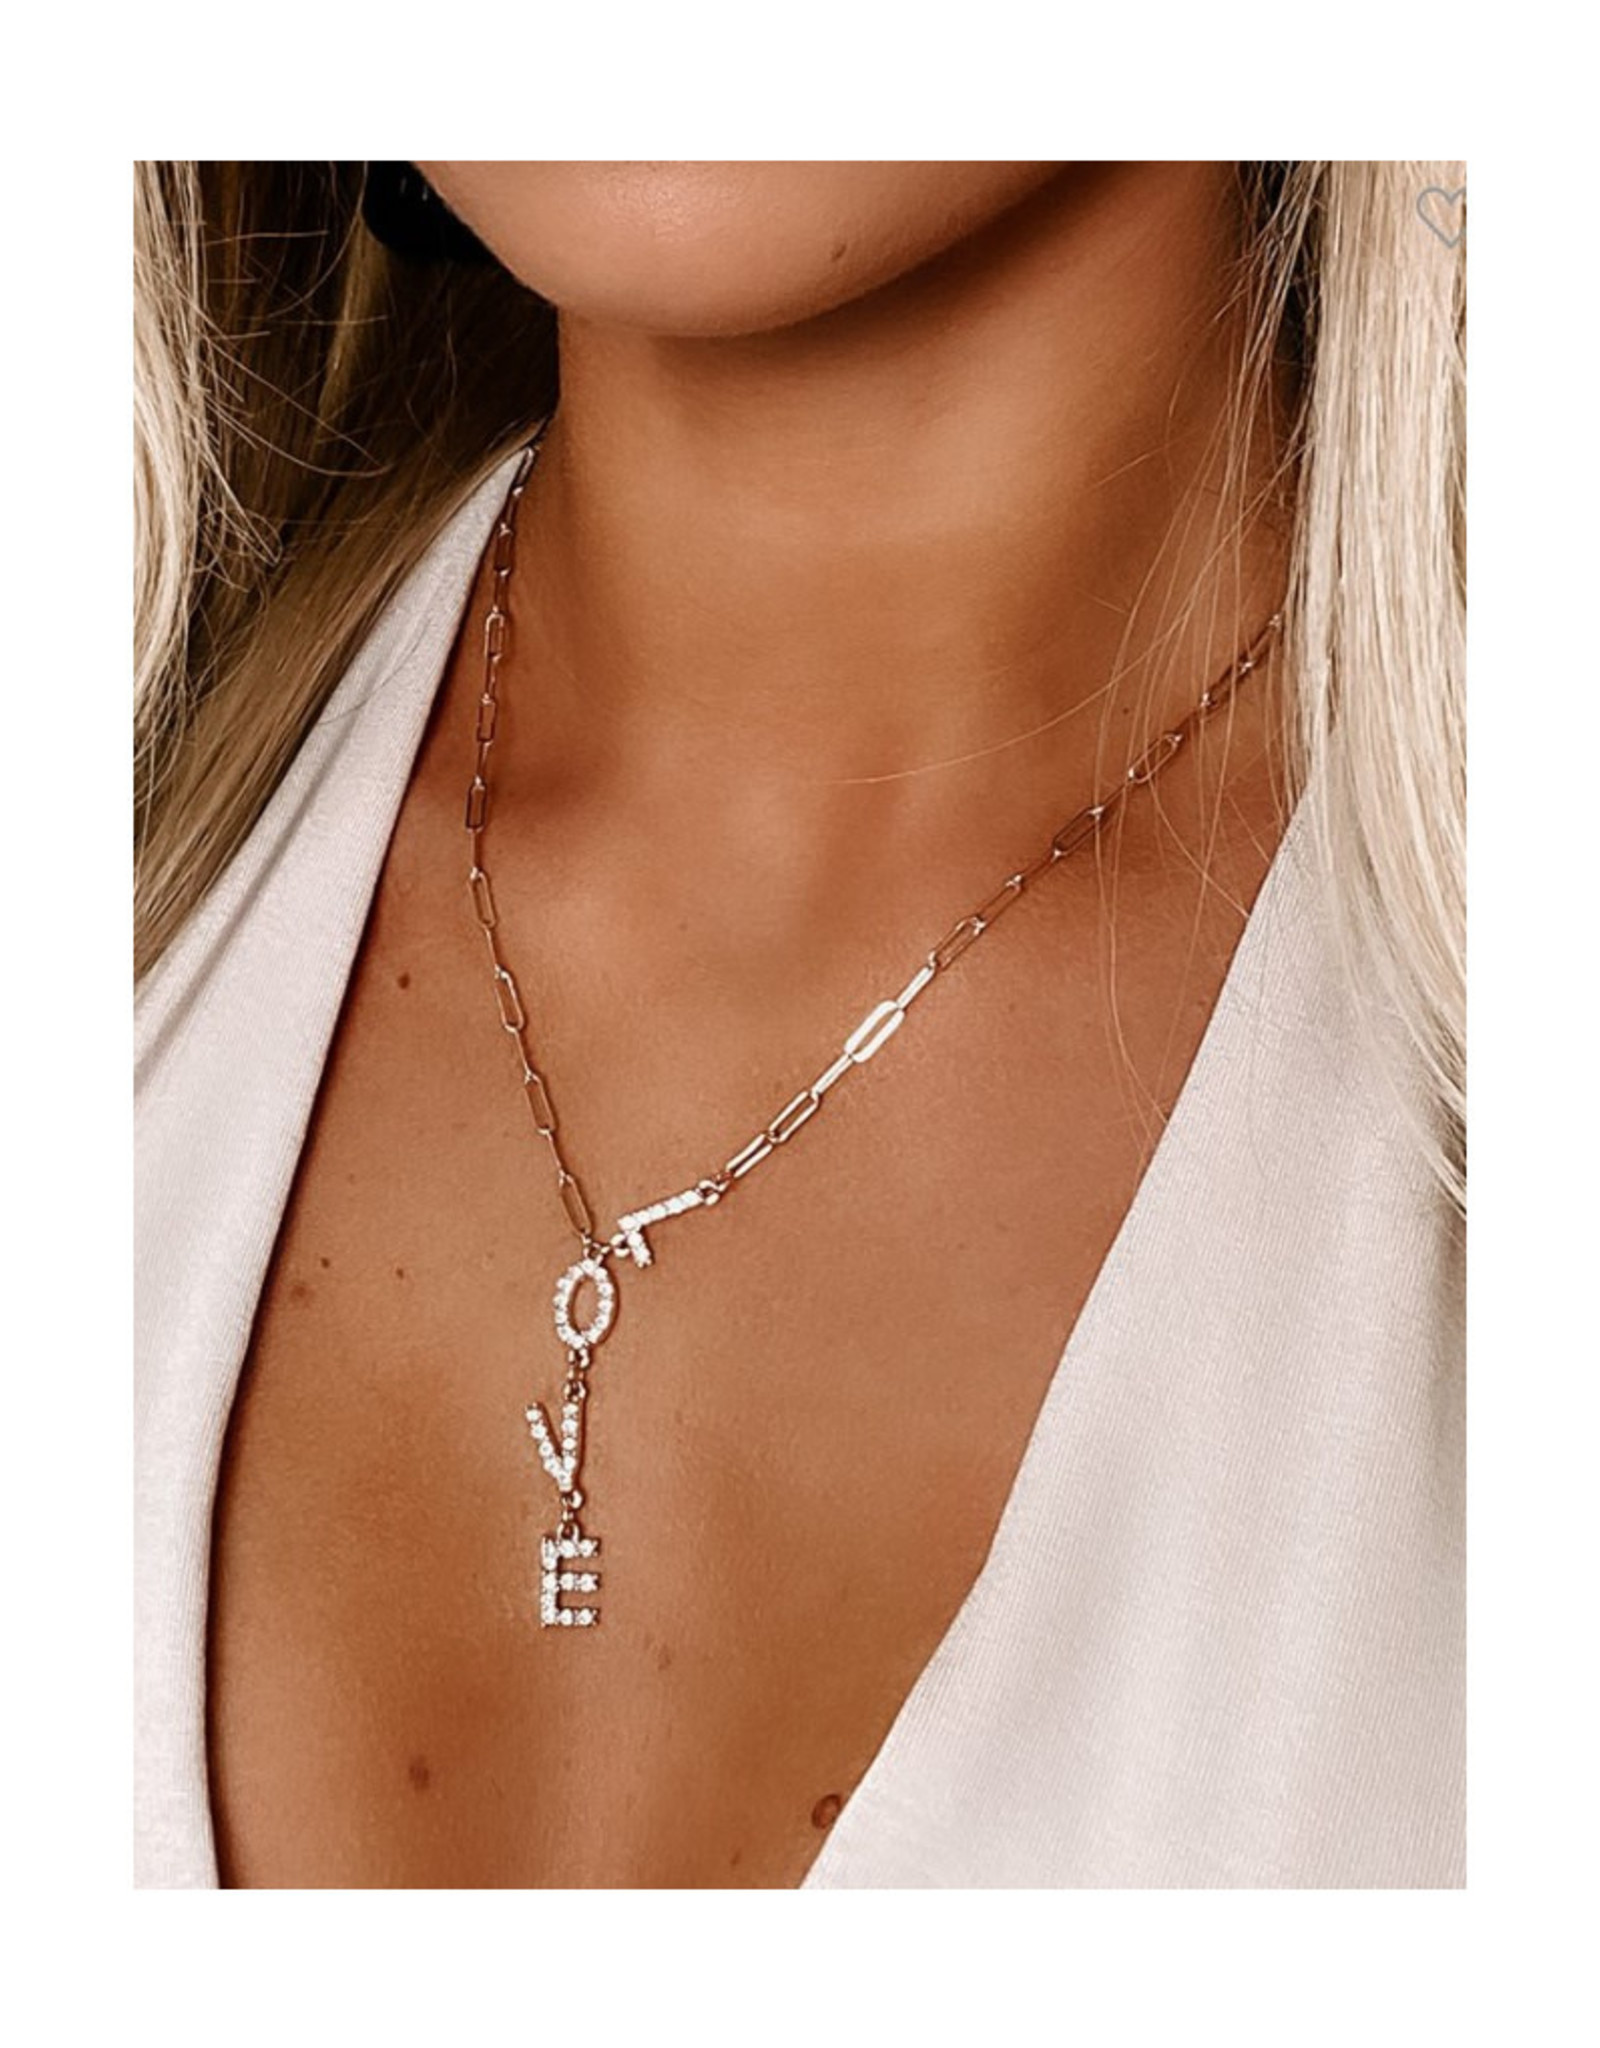 Love Lariat Necklace